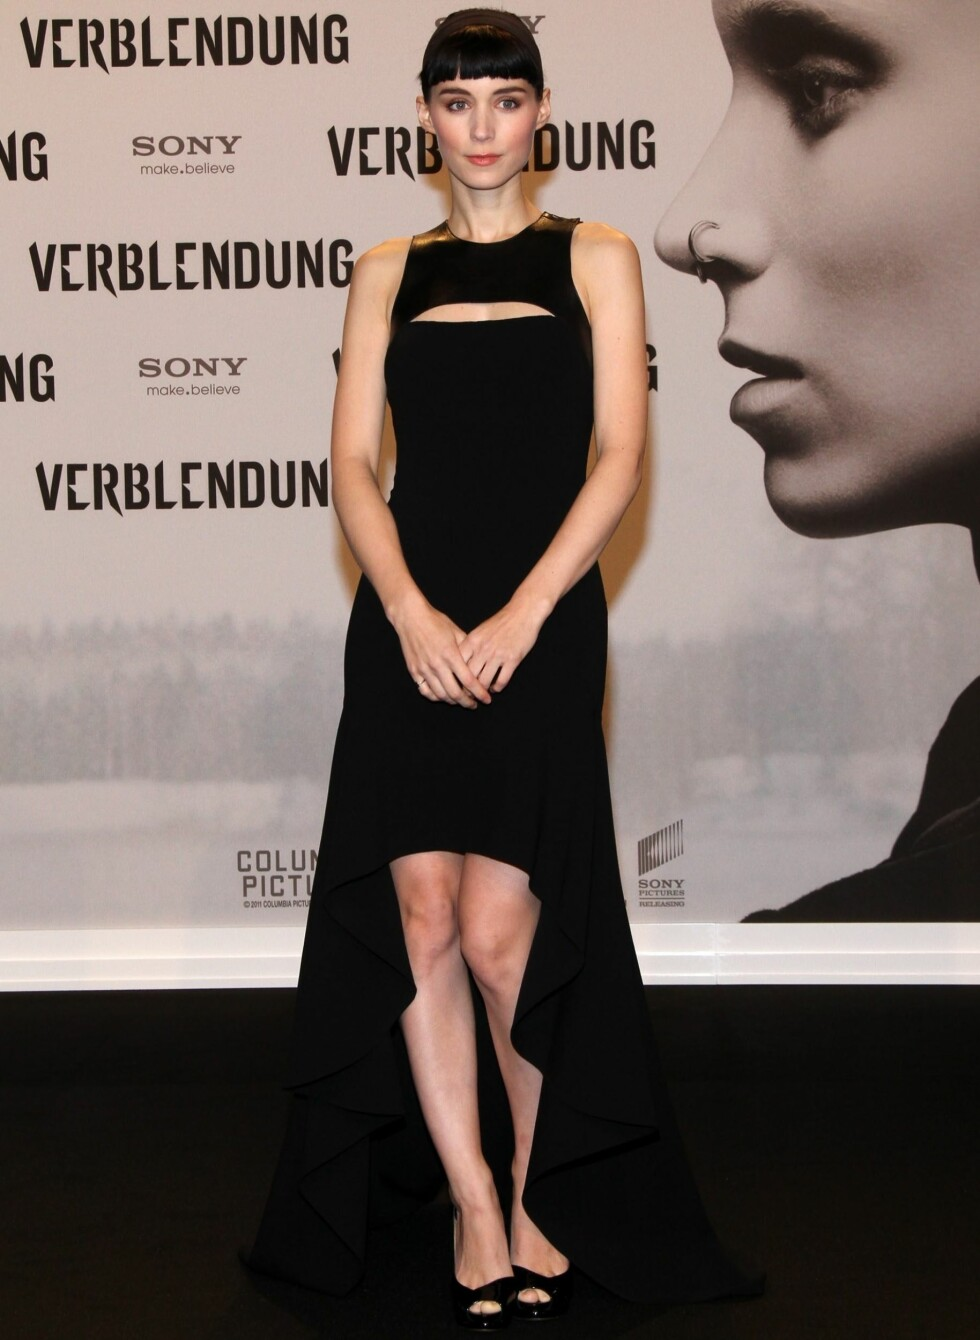 Under den tyske premieren i Berlin, iført en sort hockeykjole og sorte pumps med åpen tå. Foto: All Over Press